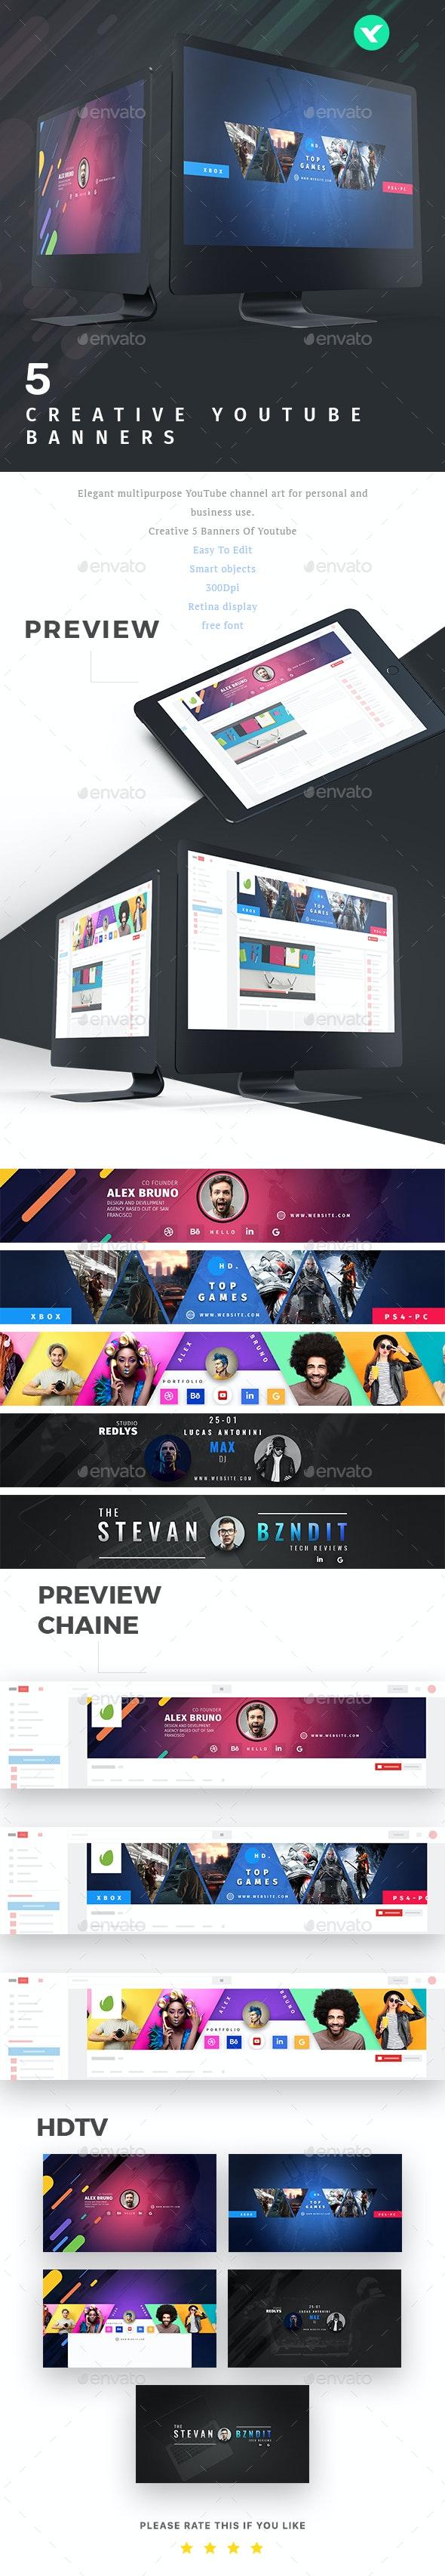 Youtube - 5 Creative Banners - YouTube Social Media